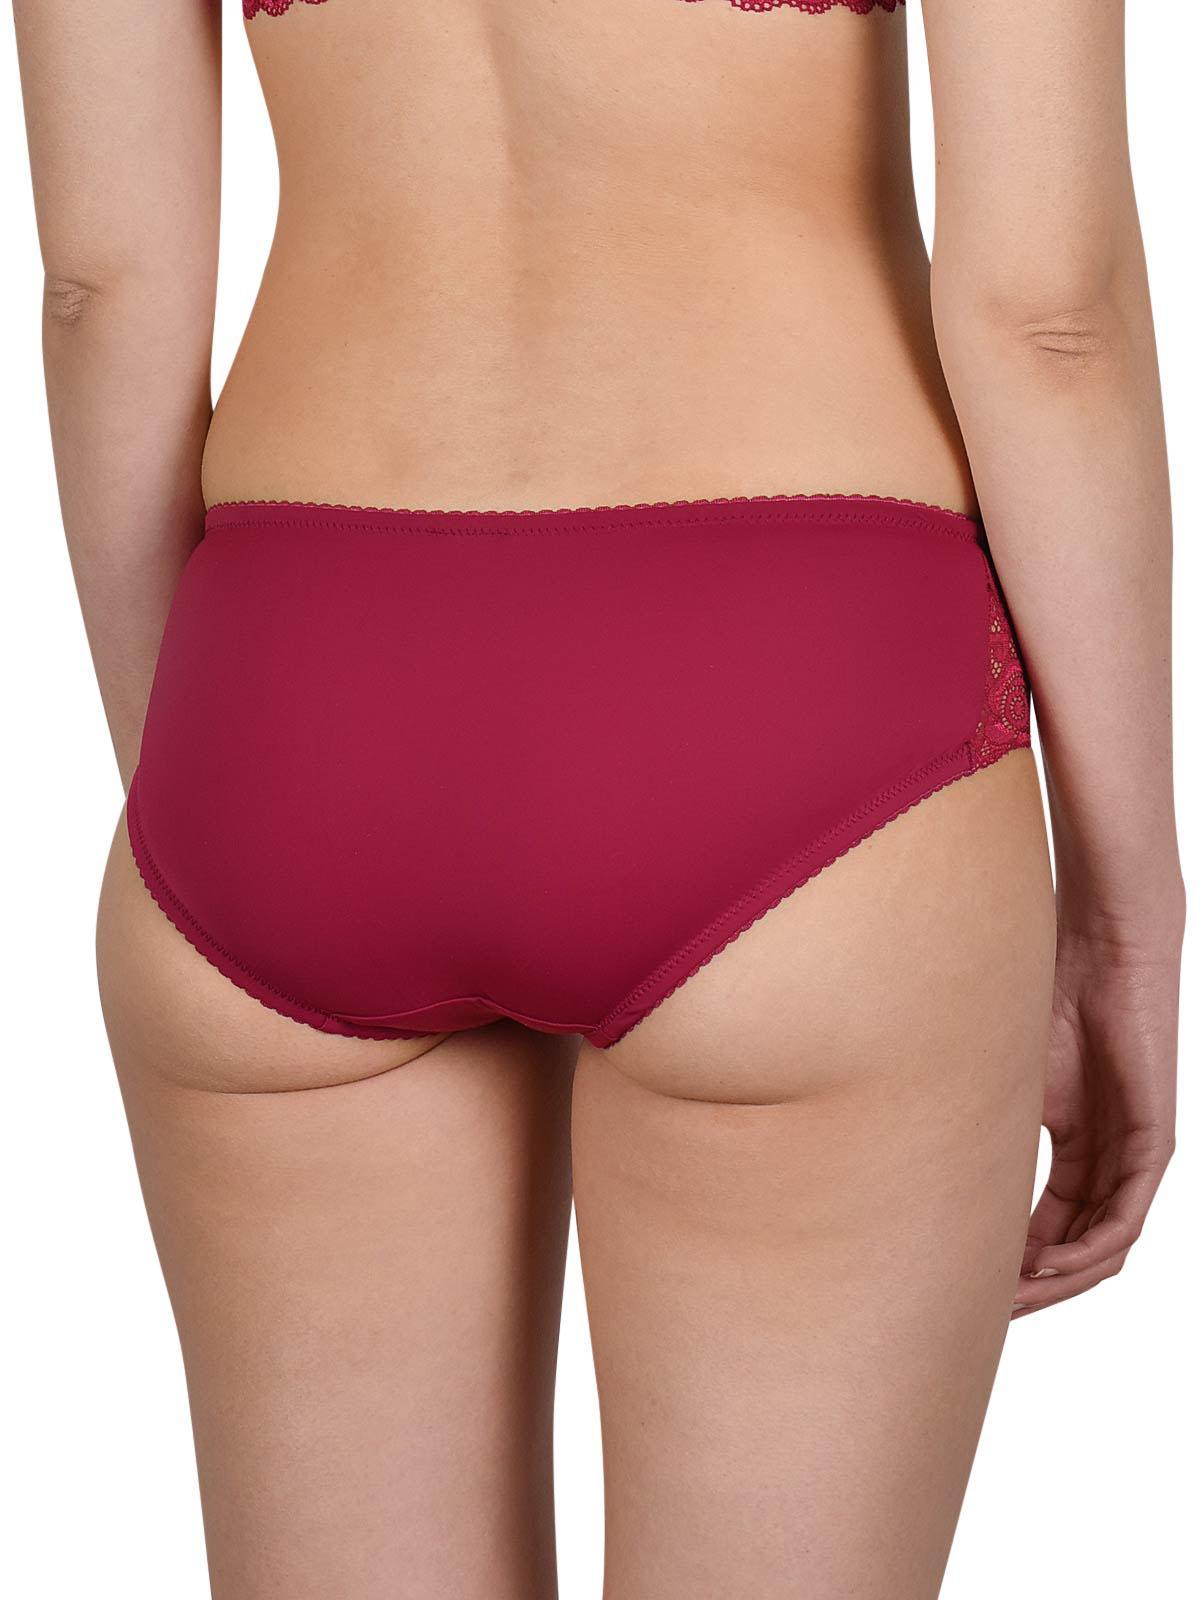 Women's Panty 4649